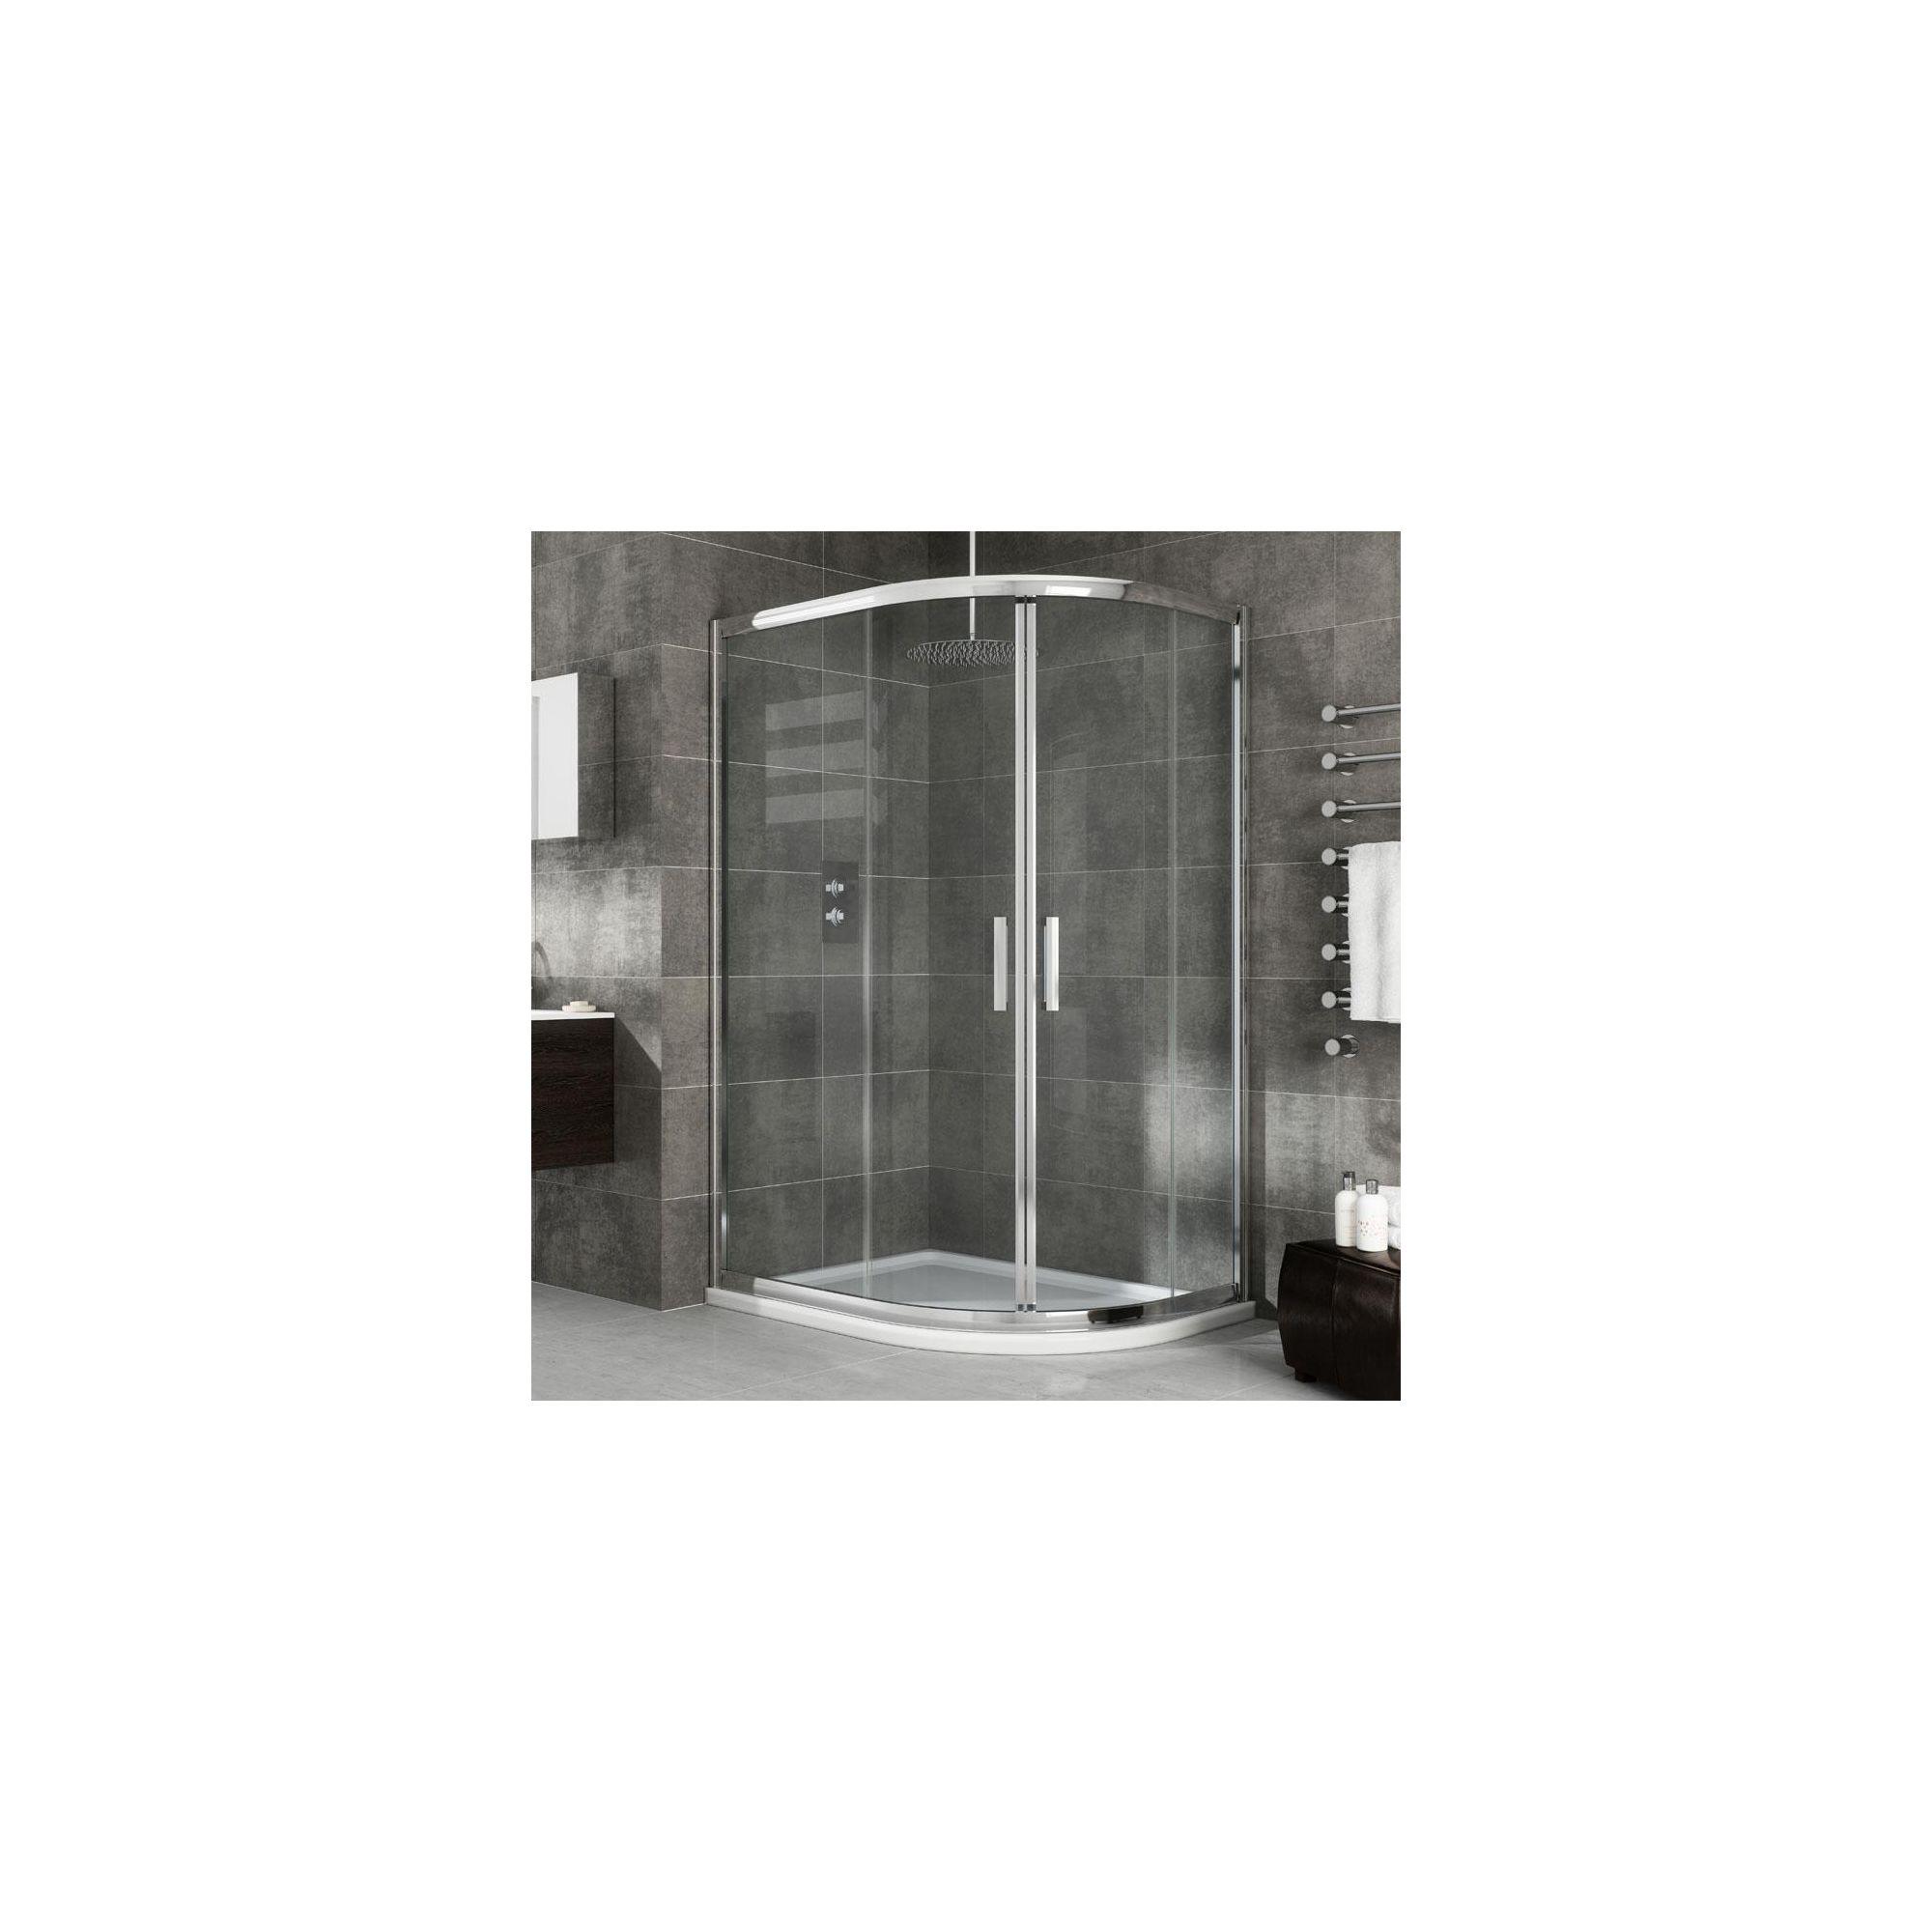 Elemis Eternity Two-Door Offset Quadrant Shower Door, 1000mm x 800mm, 8mm Glass at Tescos Direct